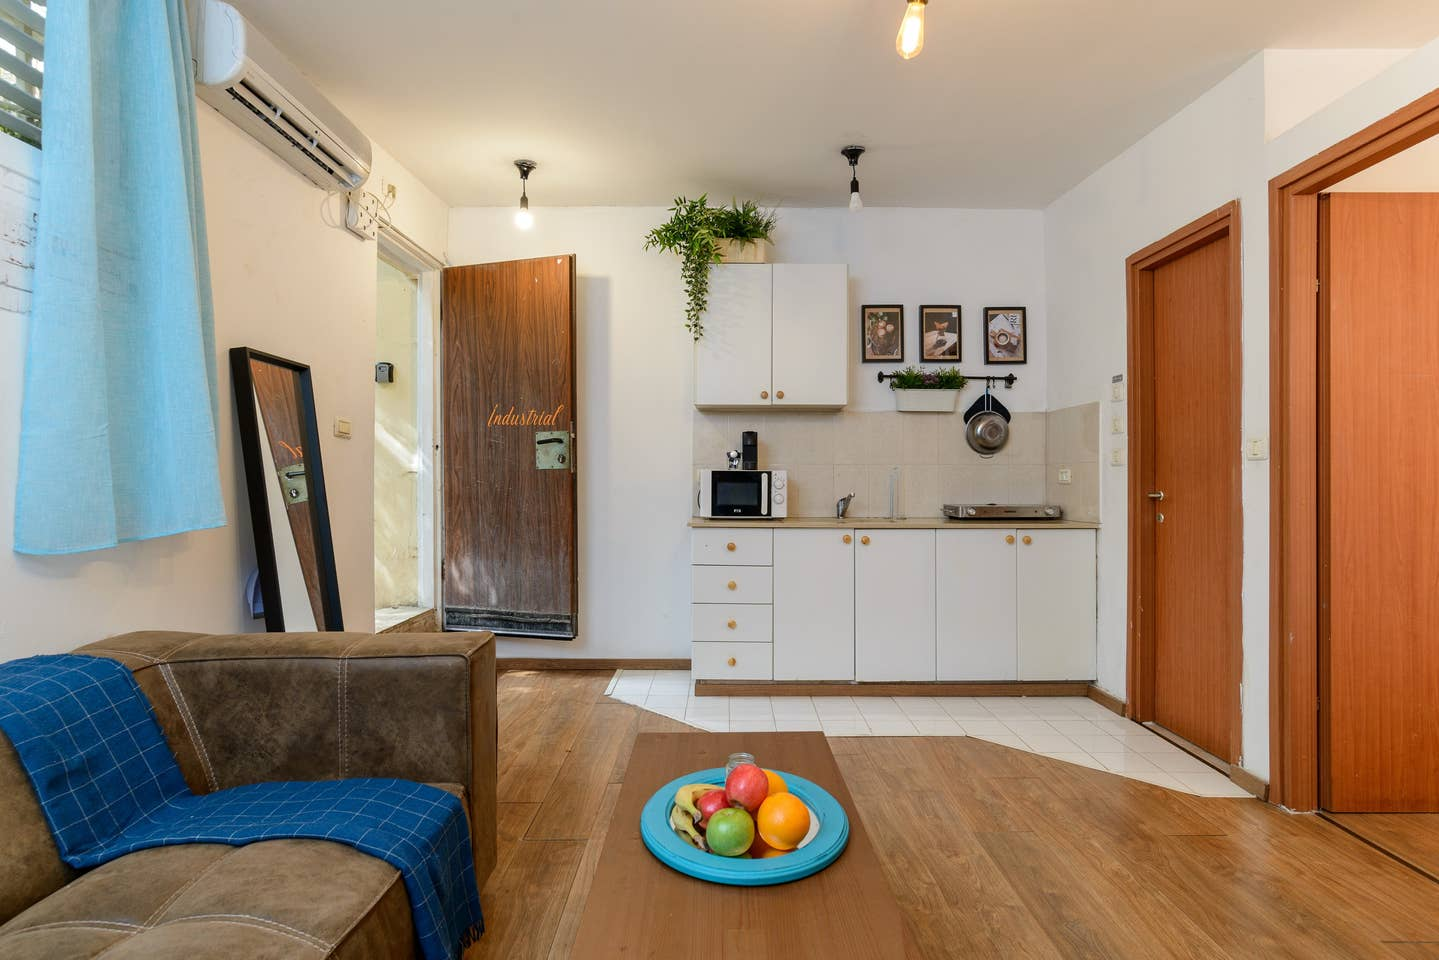 Designed apartment on Frishman Tlv photo 26044560